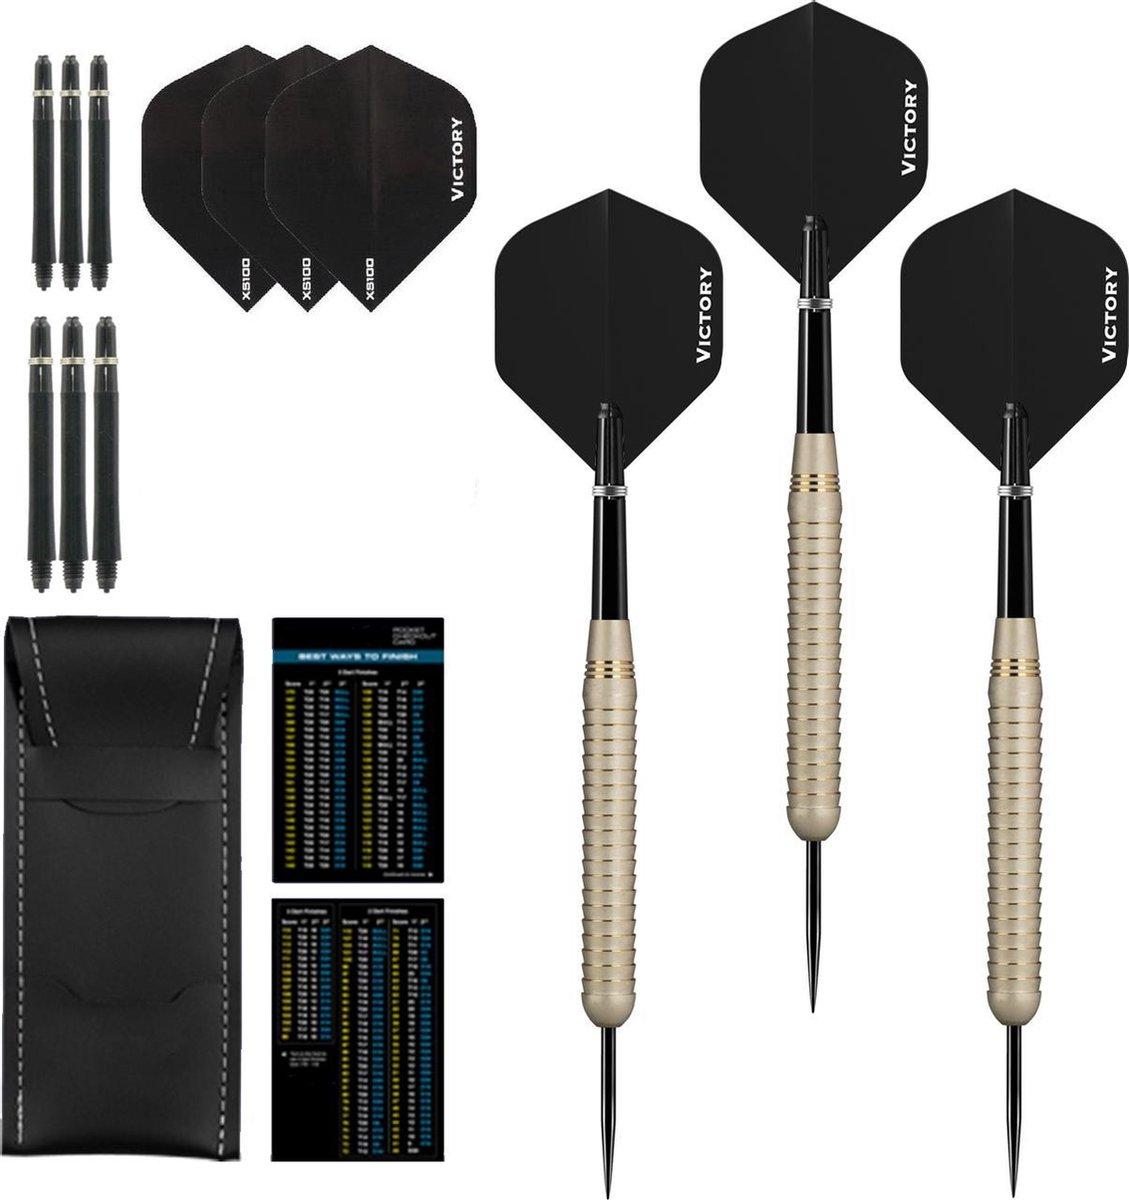 Dragon Darts White Shark - dartpijlen - dart shafts - dart flights - dartpijlen 24 gram